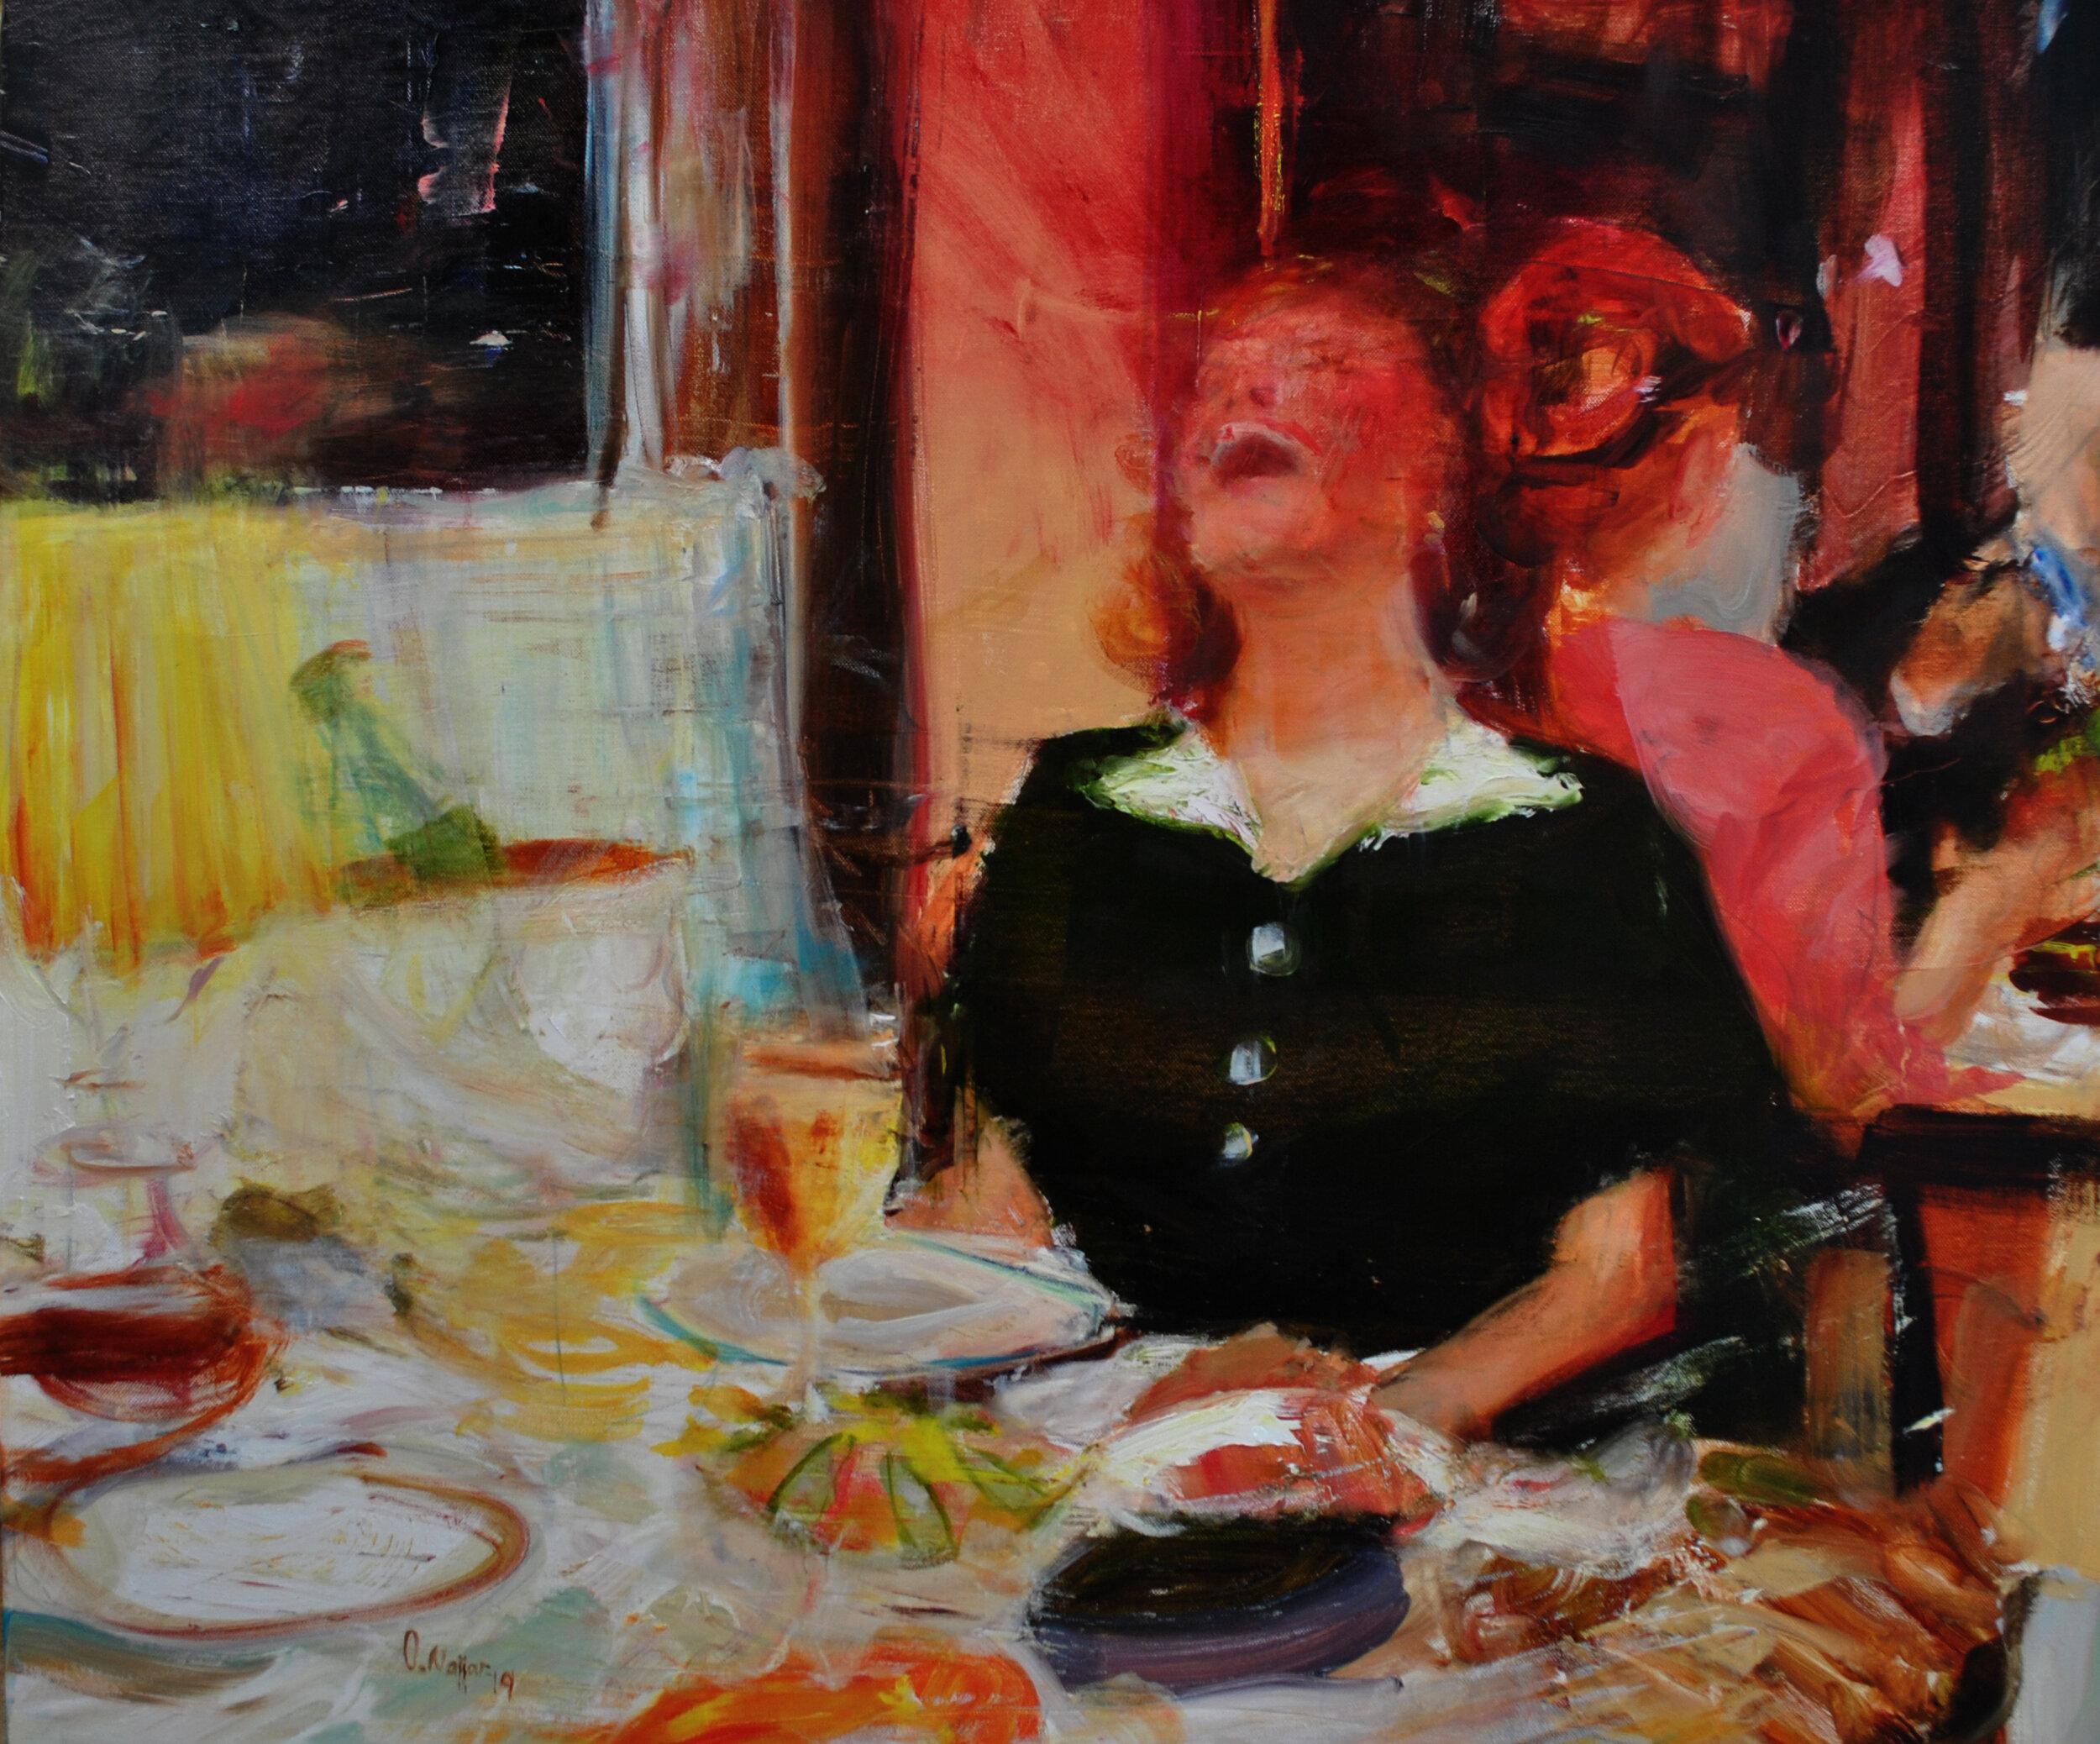 Omar Najjar, Untitled. 2018, oil on canvas, 75 x 90 cm. Courtesy of the artist.